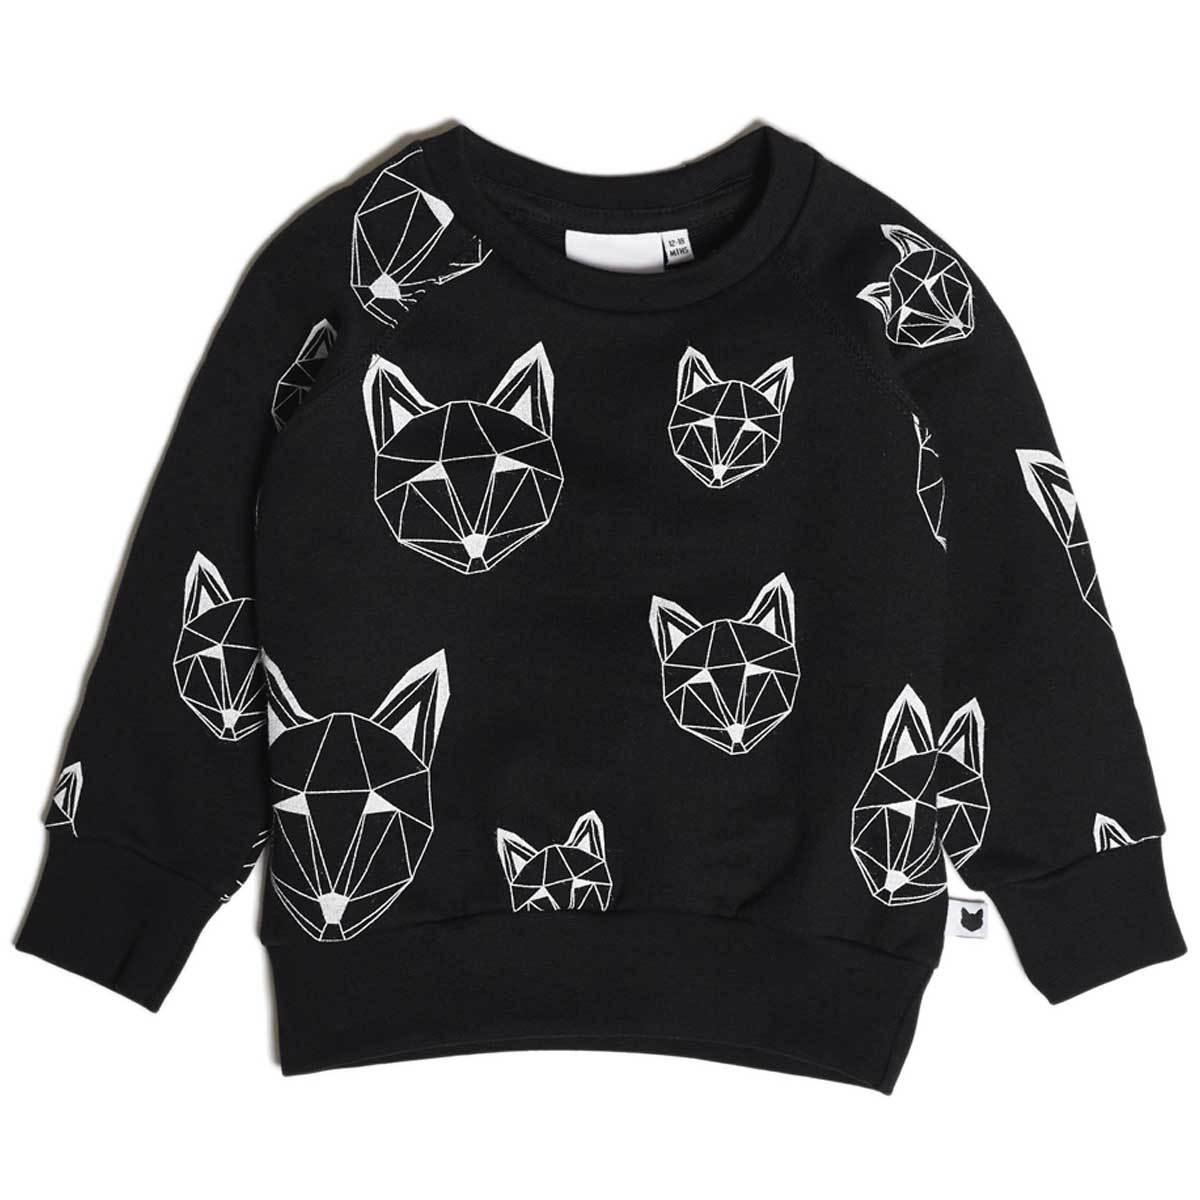 Hauts bébé Sweatshirt Just Call Me Fox - 6/12 mois Sweatshirt Just Call Me Fox - 6/12 mois